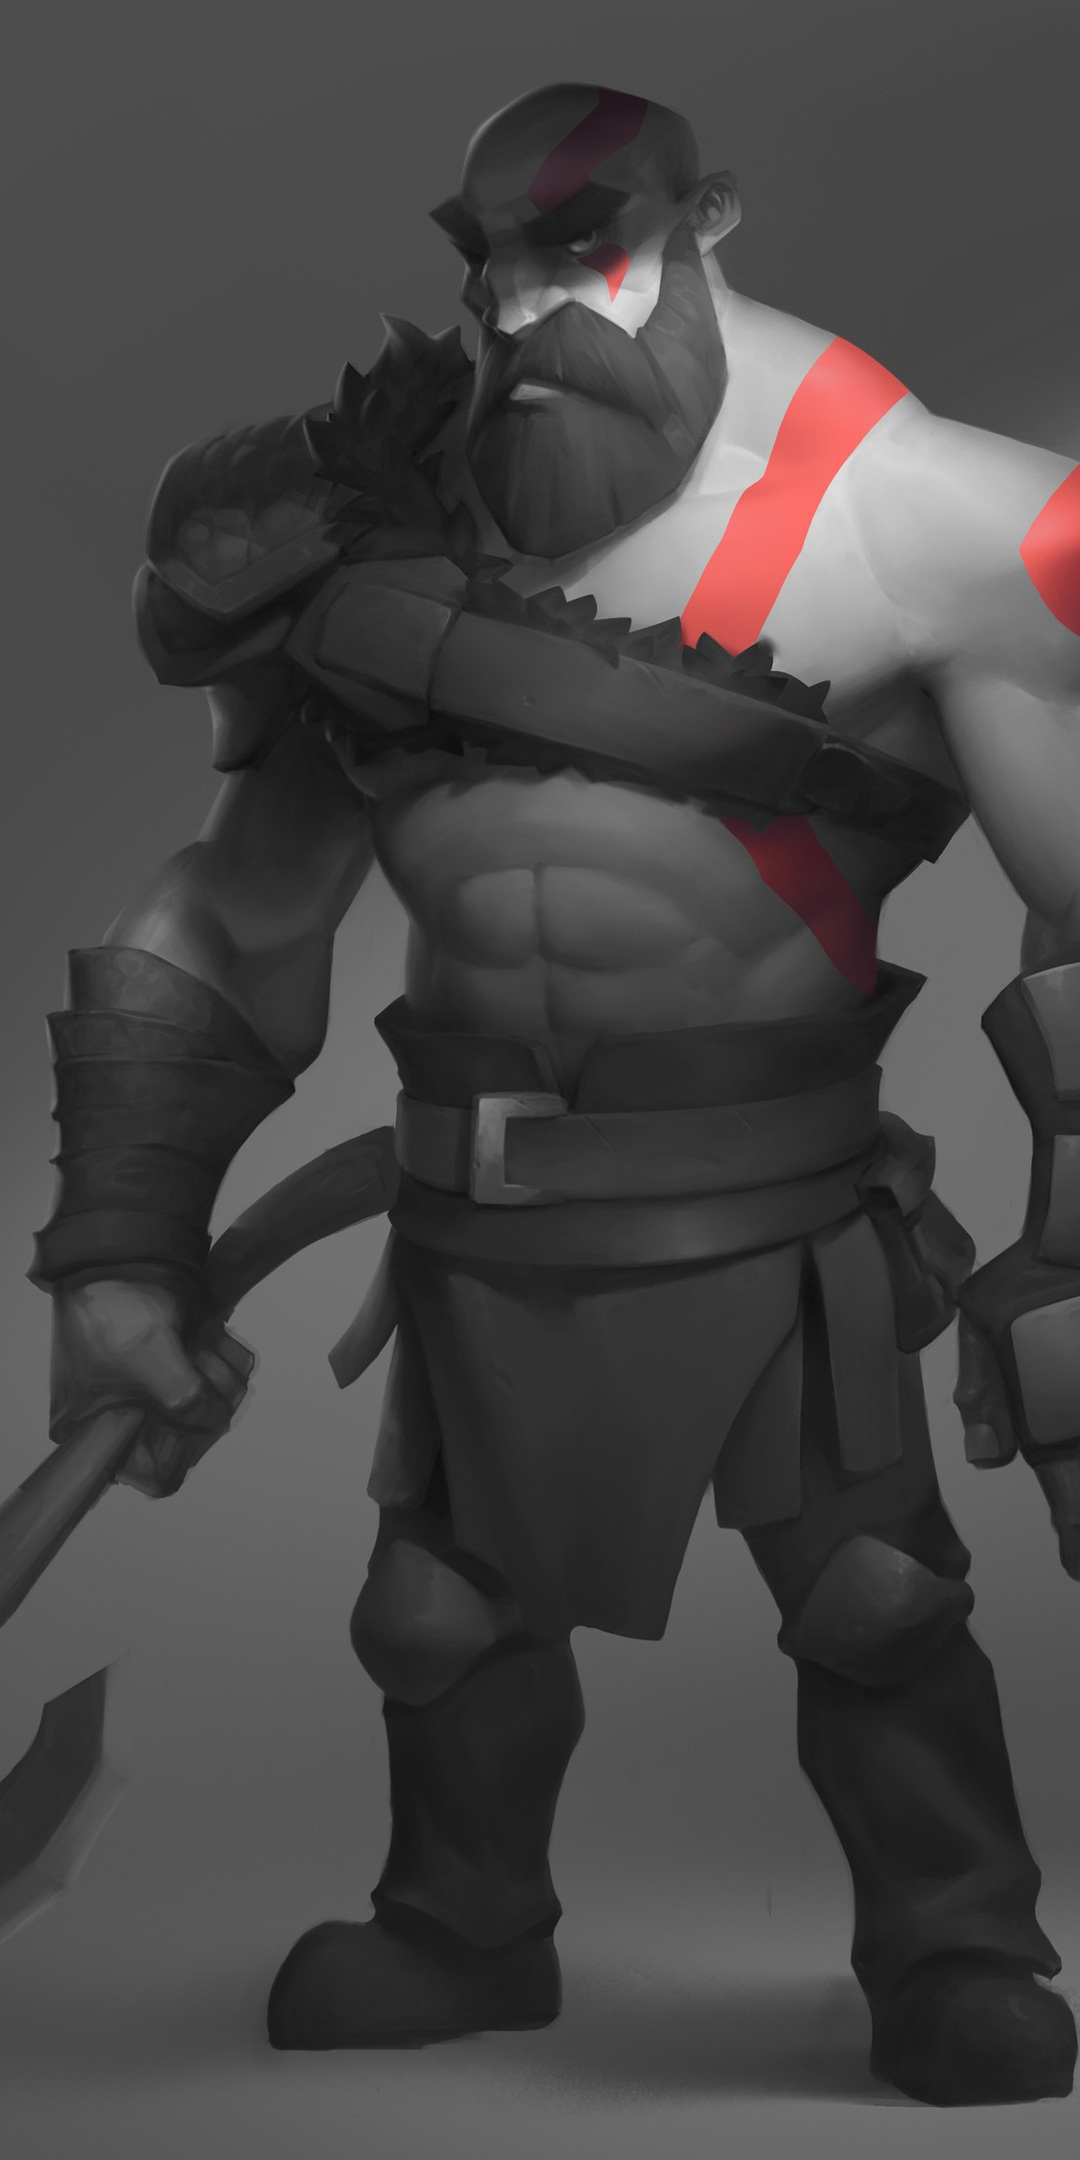 kratos-artwork-m2.jpg